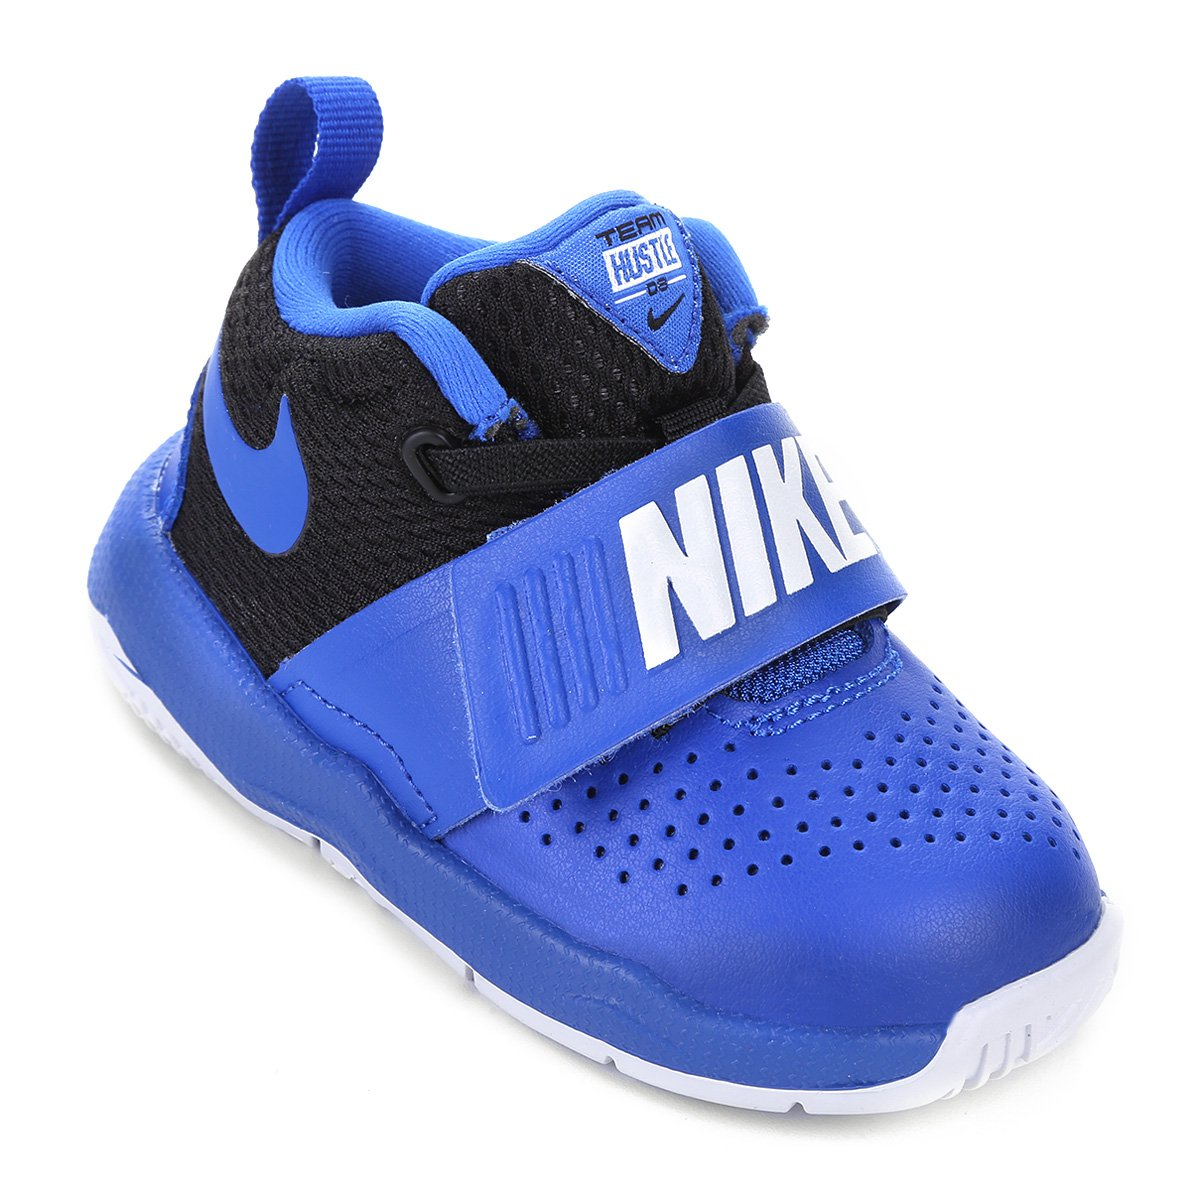 25983dd293 Tênis Infantil Couro Nike Team Hustle D Masculino - Azul Royal e Preto -  Compre Agora